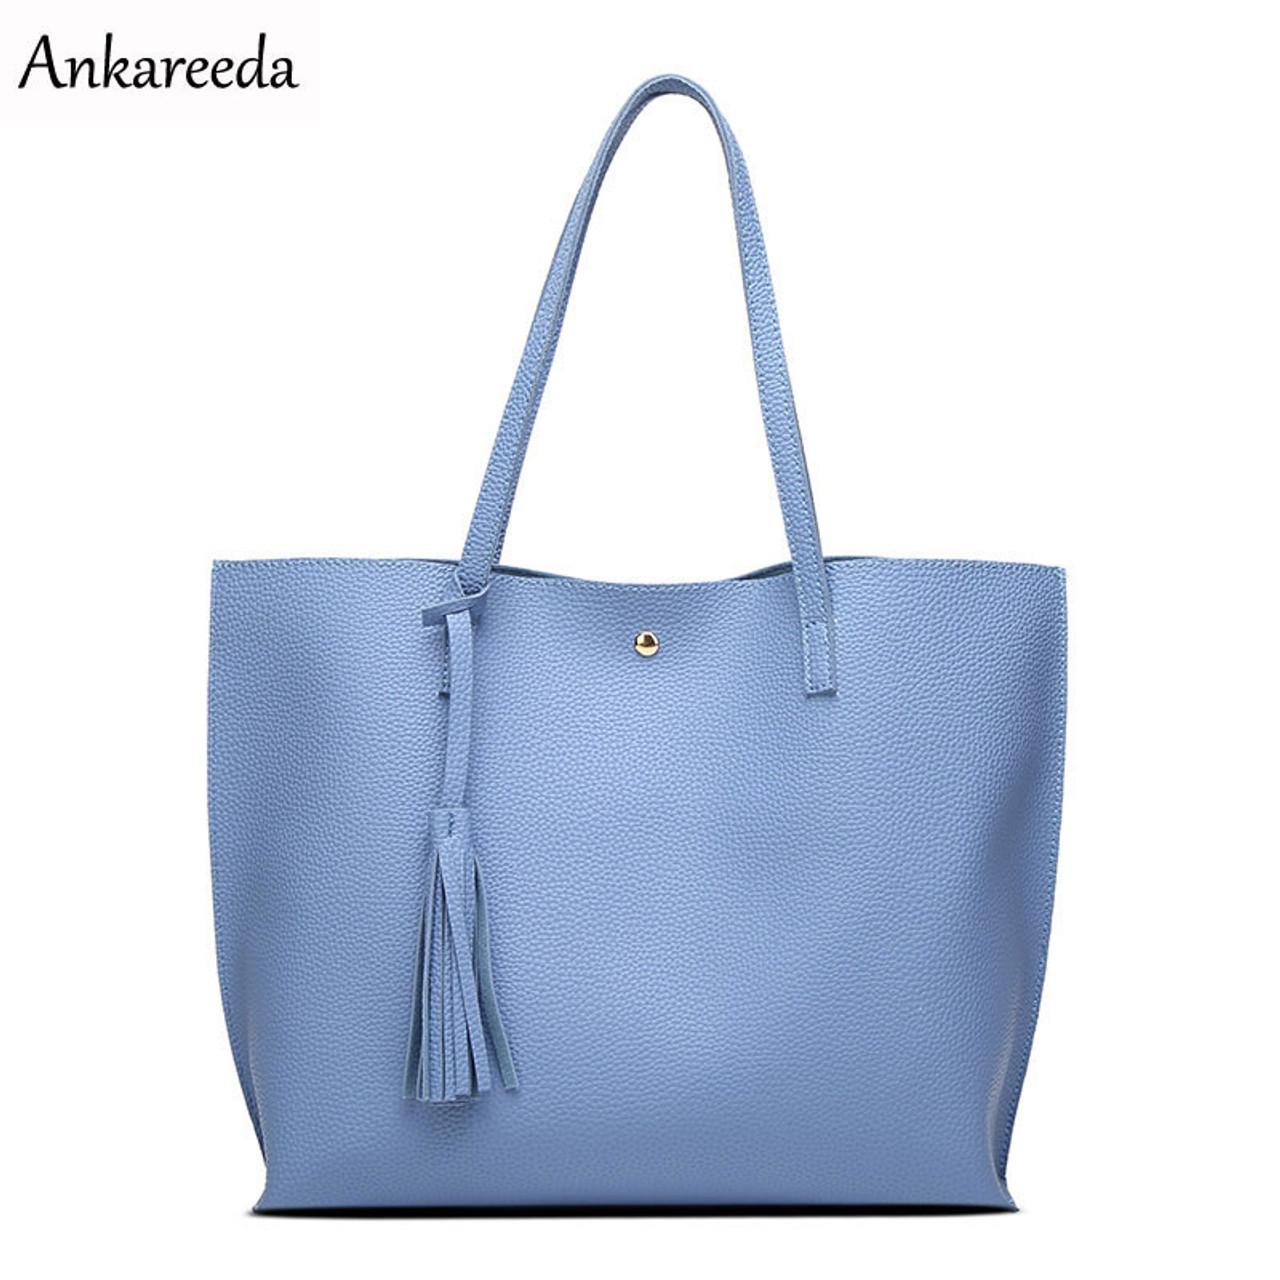 Ankareeda Luxury Brand Women Shoulder Bag Soft Leather TopHandle Bags  Ladies Tassel Tote Handbag High Quality Women's Handbags - OnshopDeals.Com